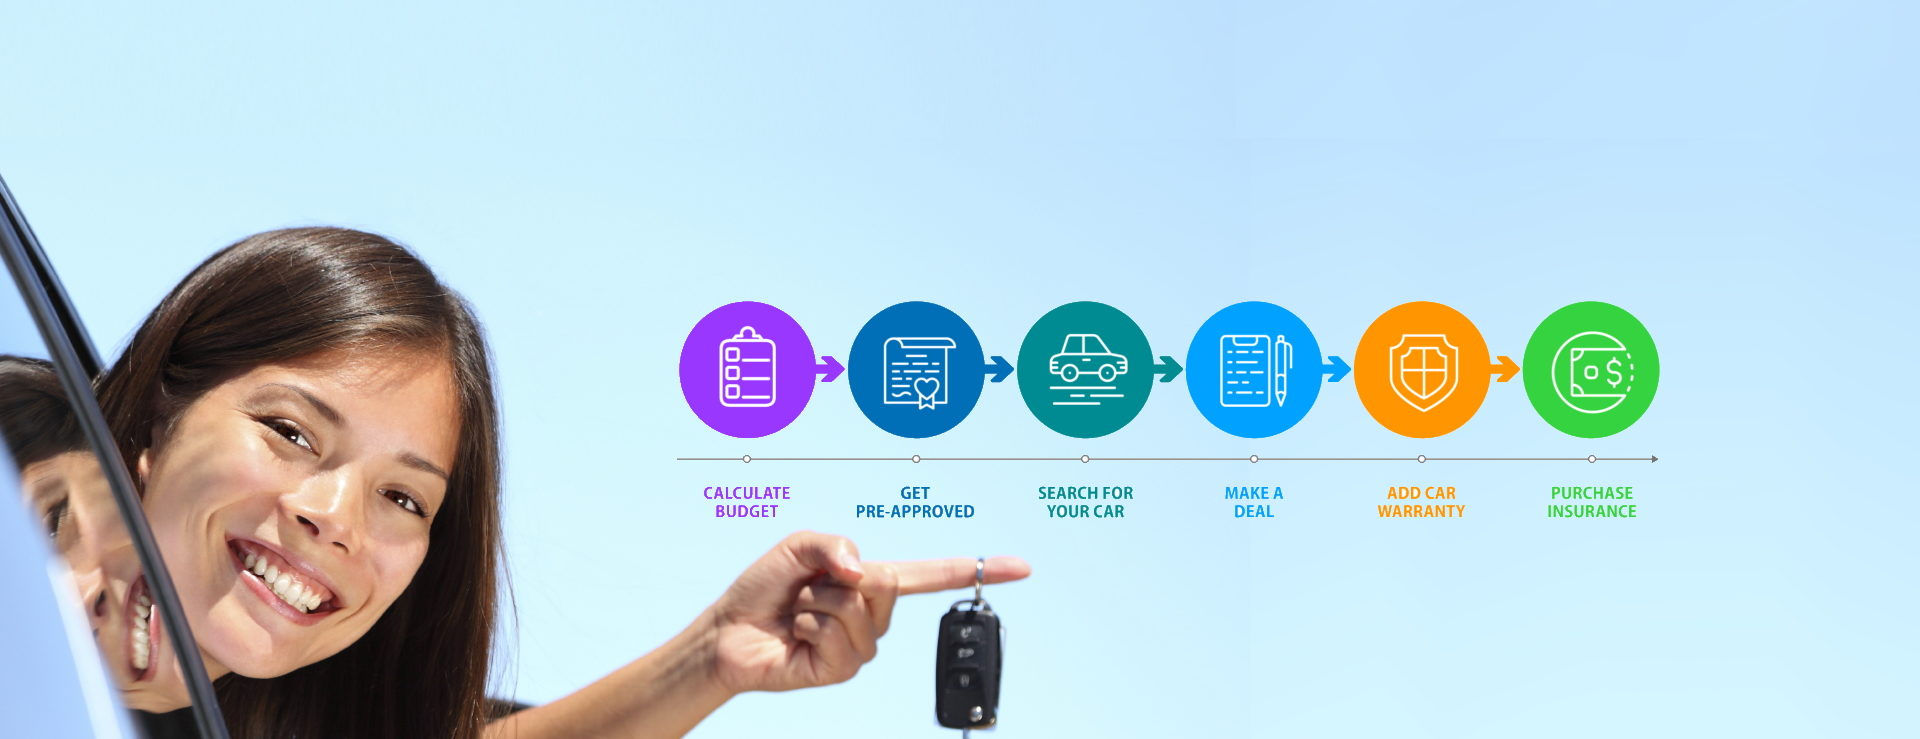 car-buying-guide-2